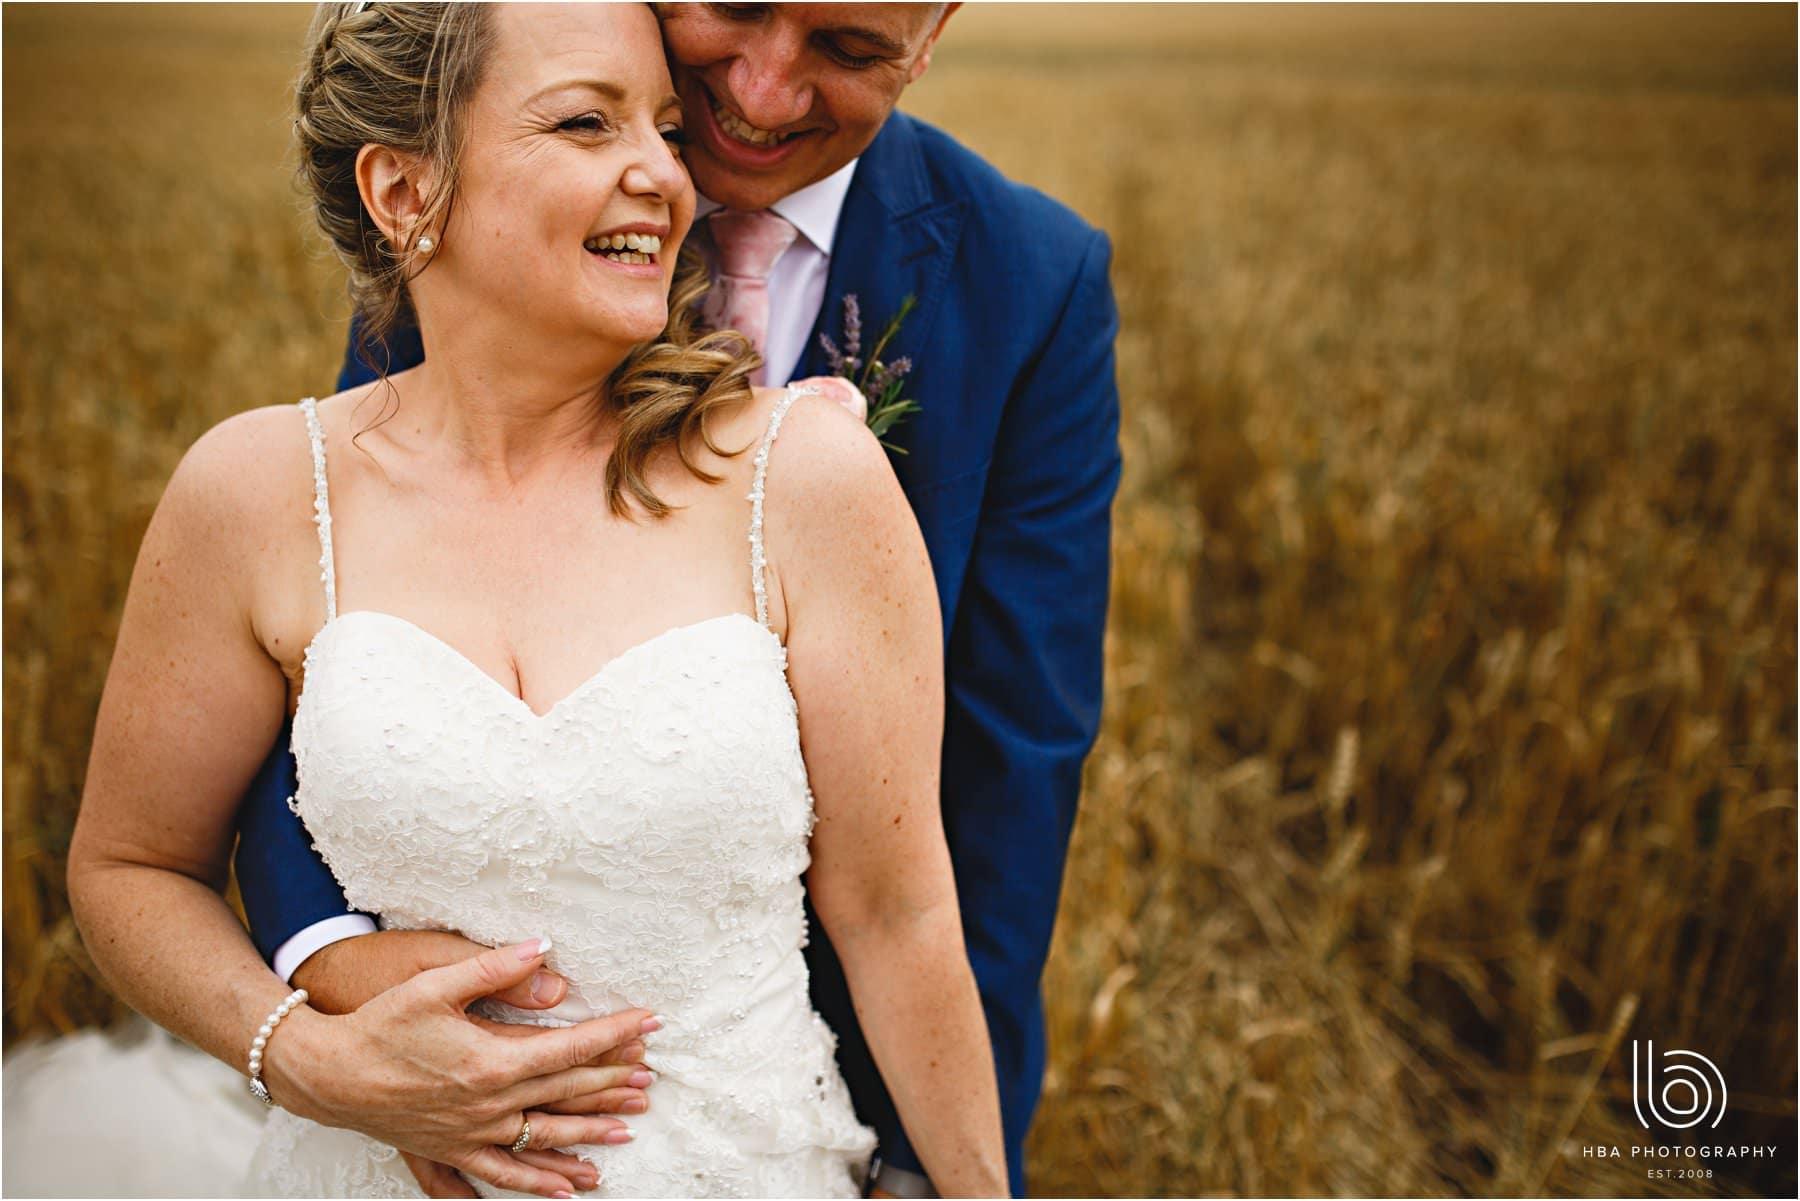 the bride & groom in the corn field